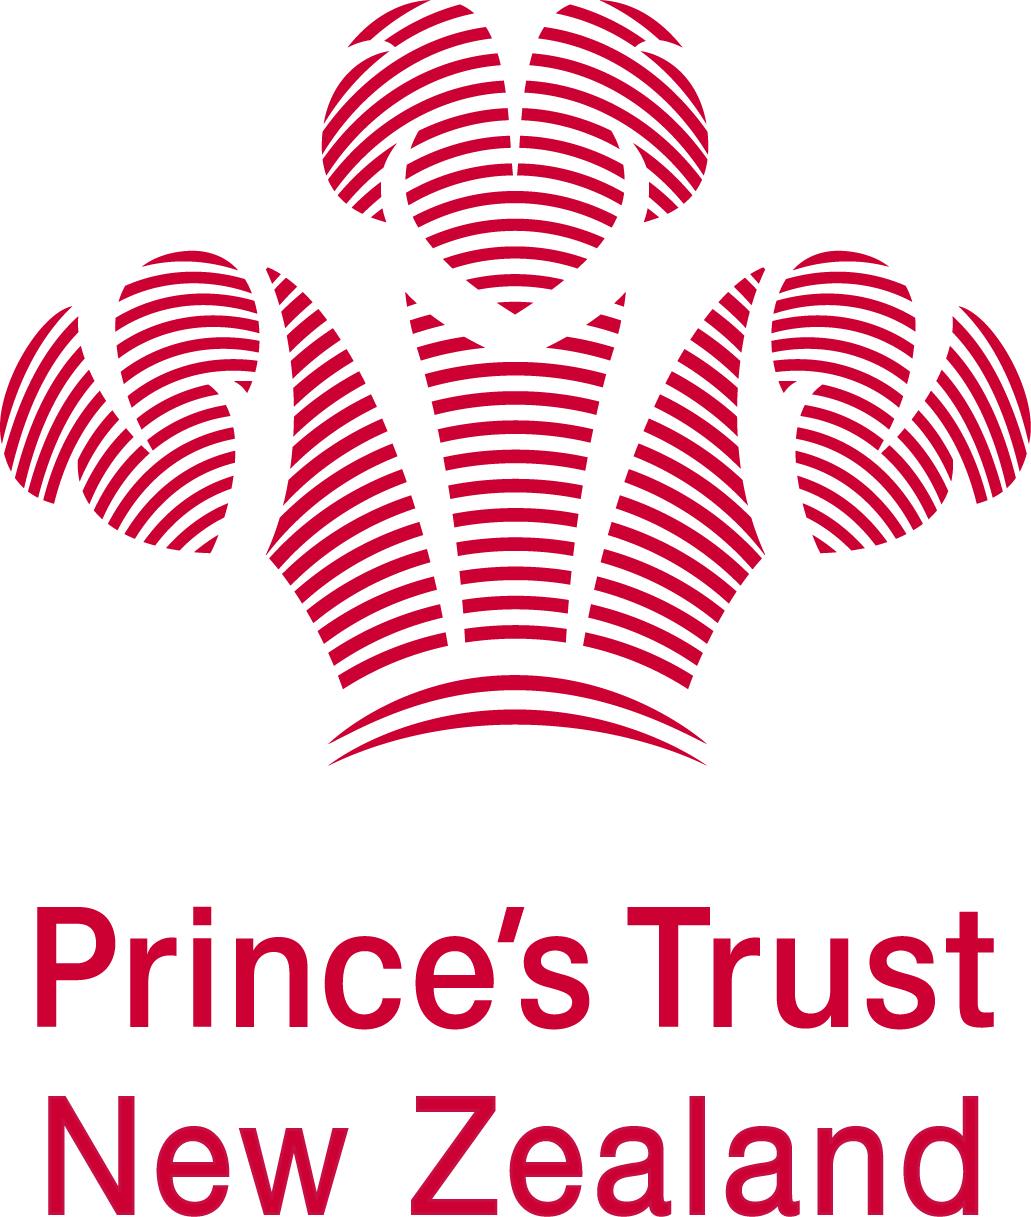 Prince's Trust New Zealand Logo